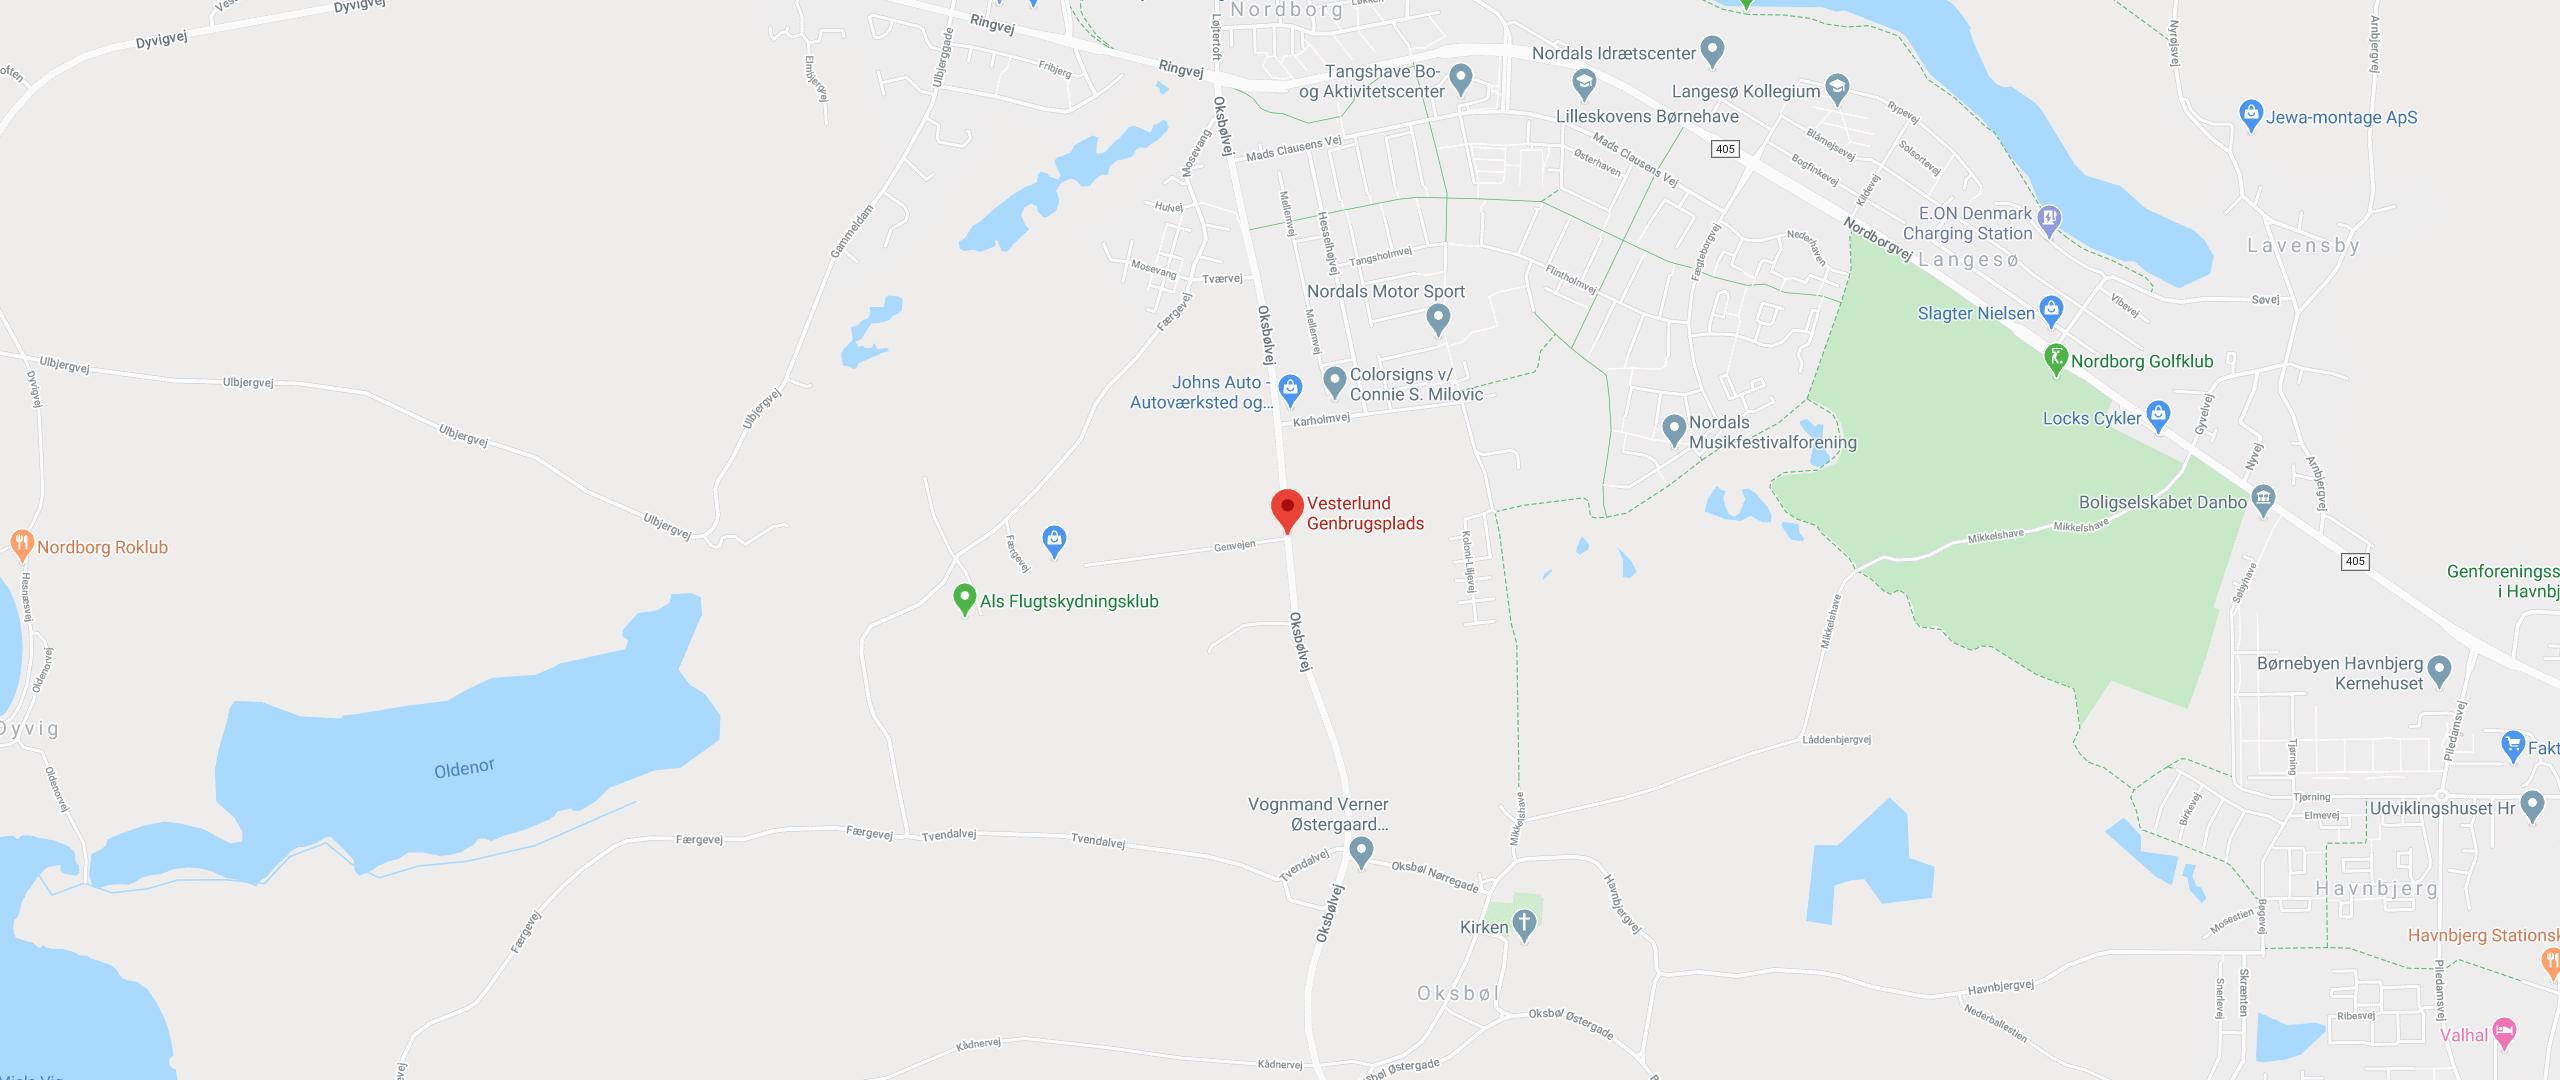 Vesterlund Genbrugsplads, Genvejen 1-5, Nordborg